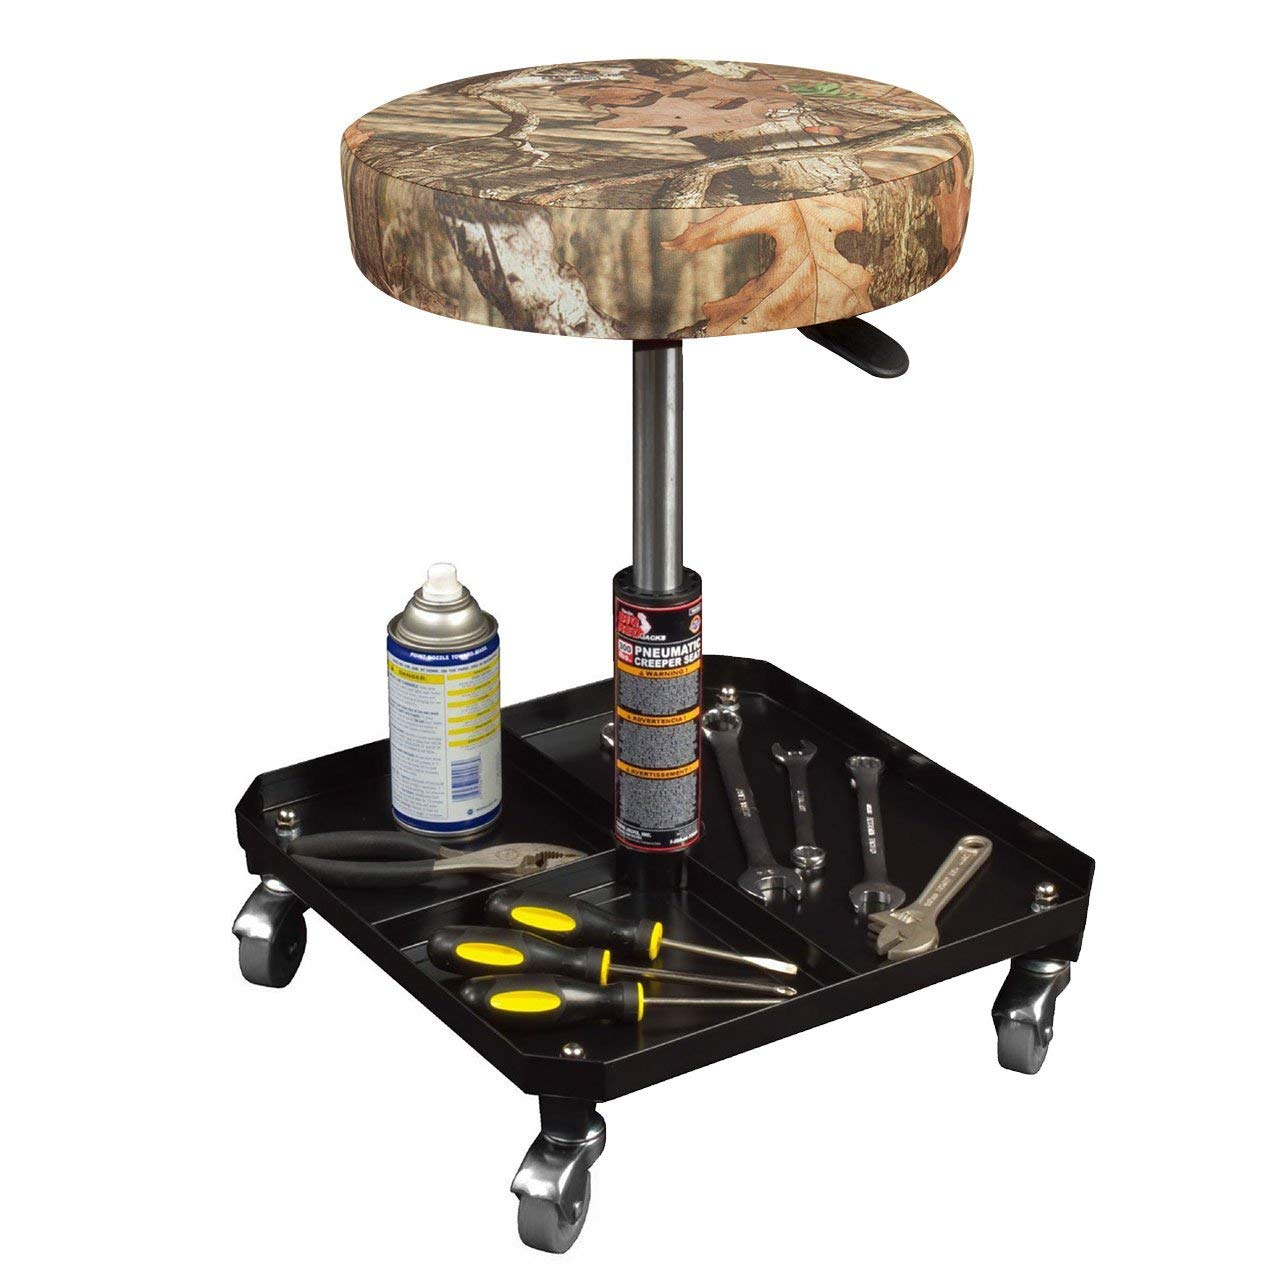 Torin Big Red Rolling Pneumatic Creeper Garage//Shop Seat Padded Adjustable Mechanic Stool Renewed Mossy Oak Camo